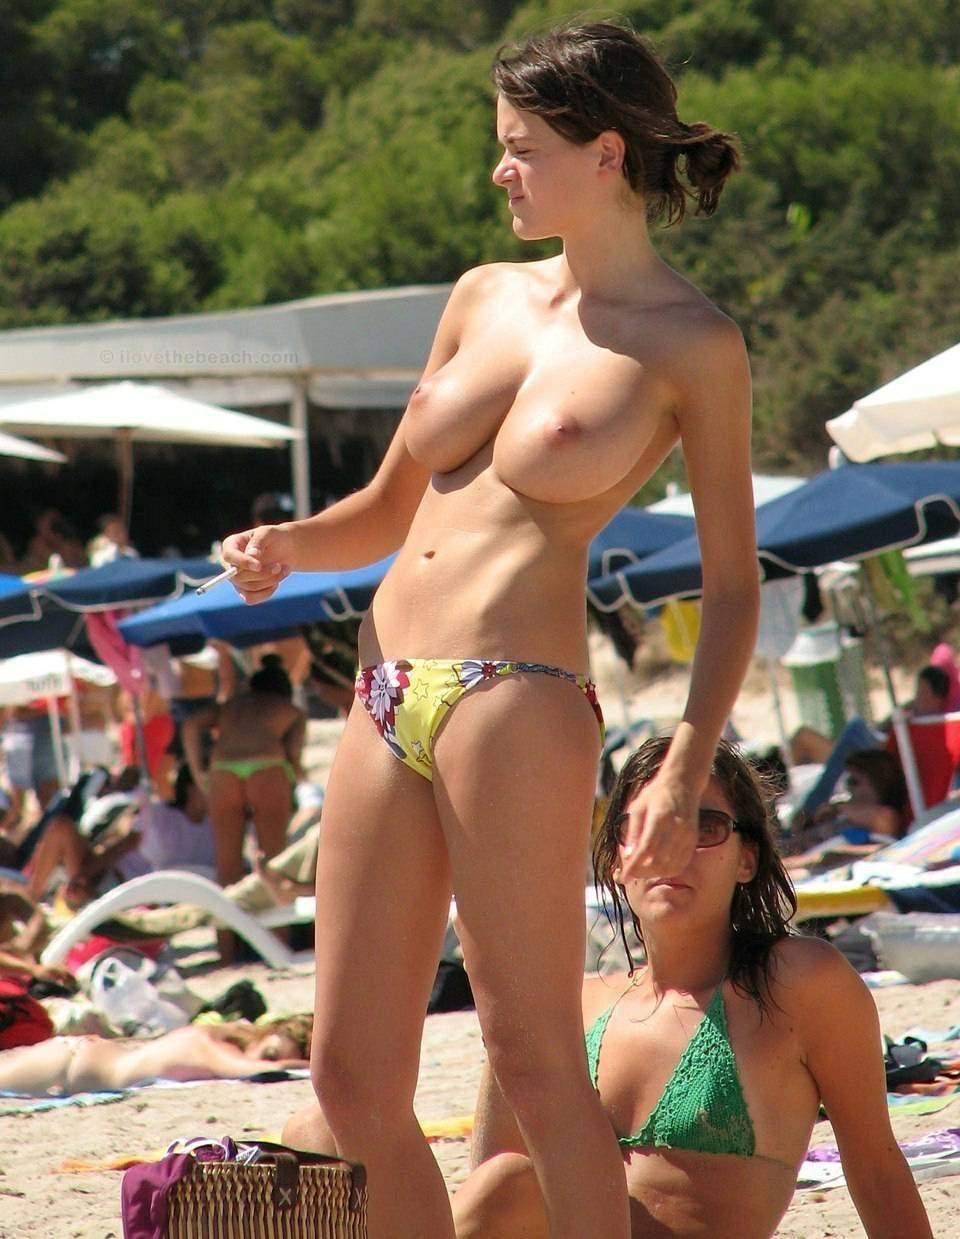 Tits On Beach photo 12